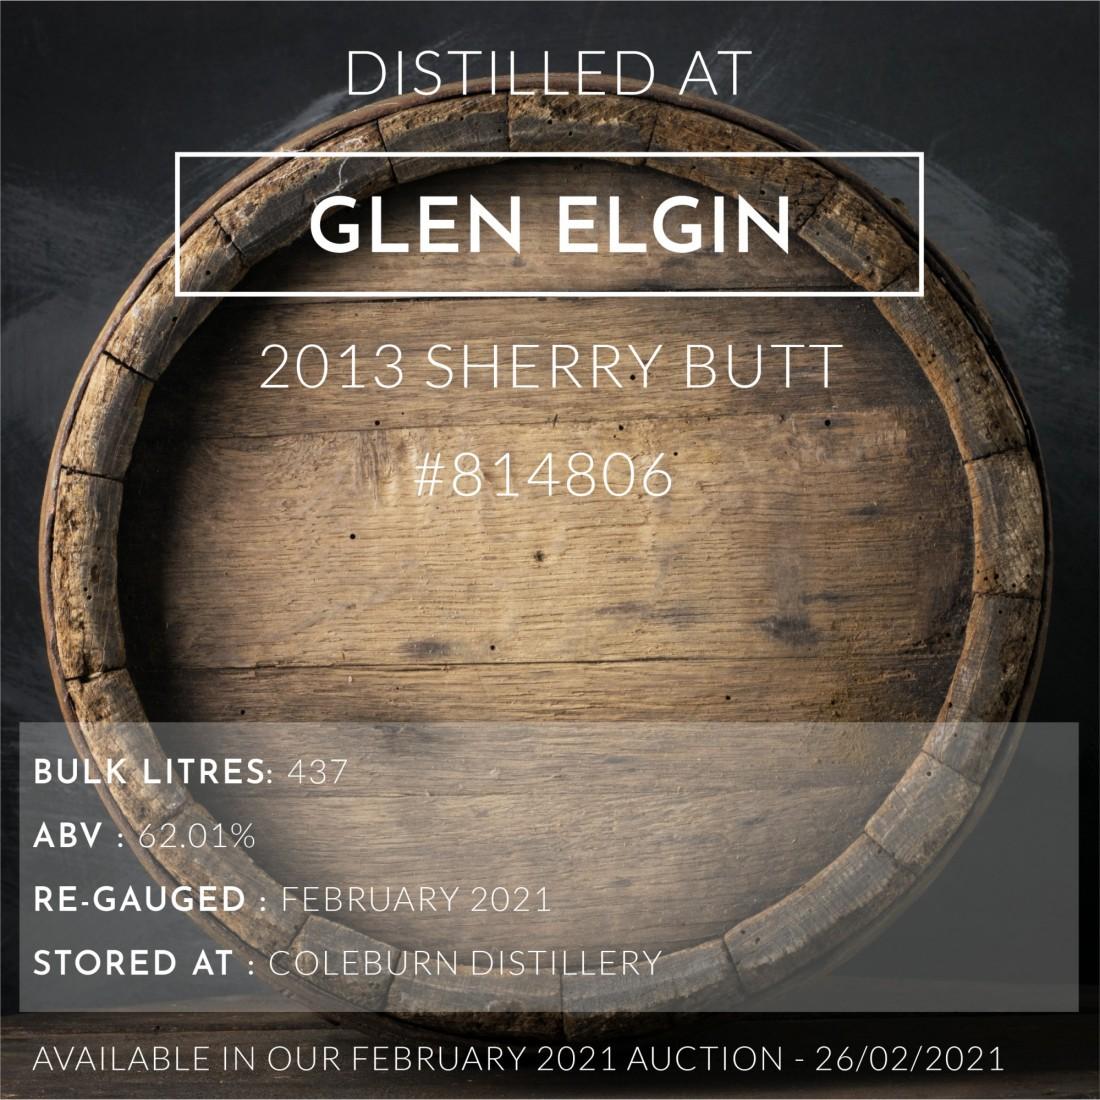 1 Glen Elgin 2013 Sherry Butt #814806 / Cask in storage at Coleburn